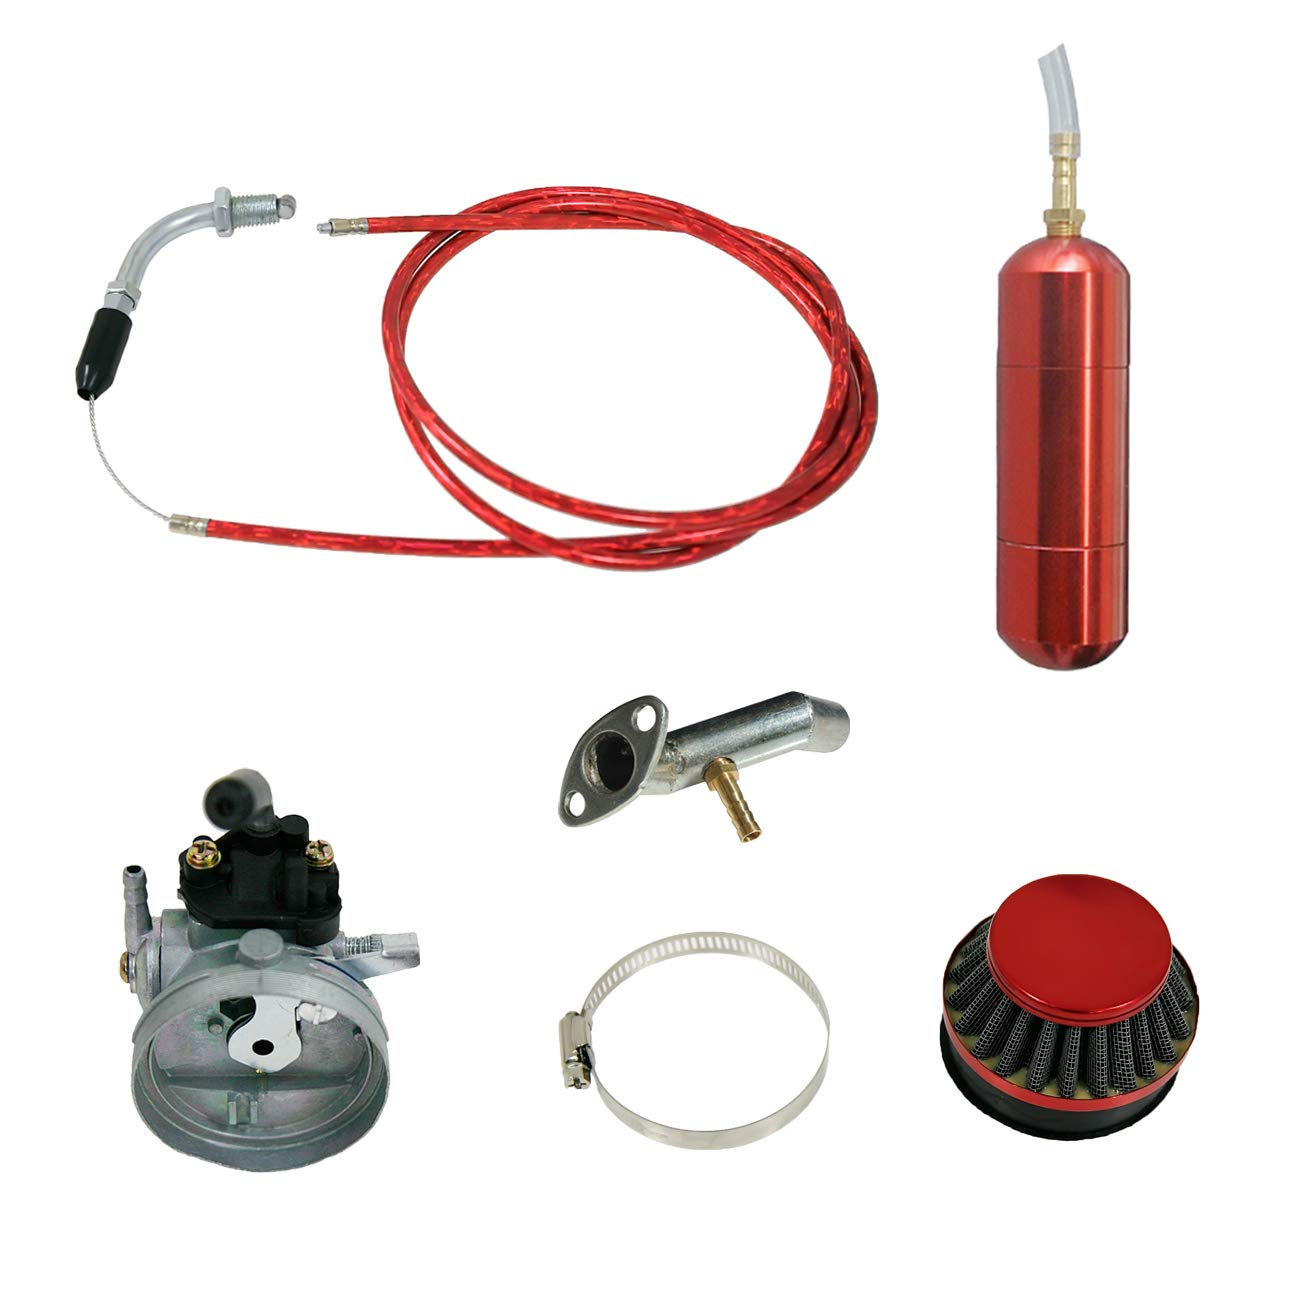 NORTHTIGER Red Carburetor&Power Boost Bottle&Air Filter Fit 49/60/66/80cc Motorized Bike